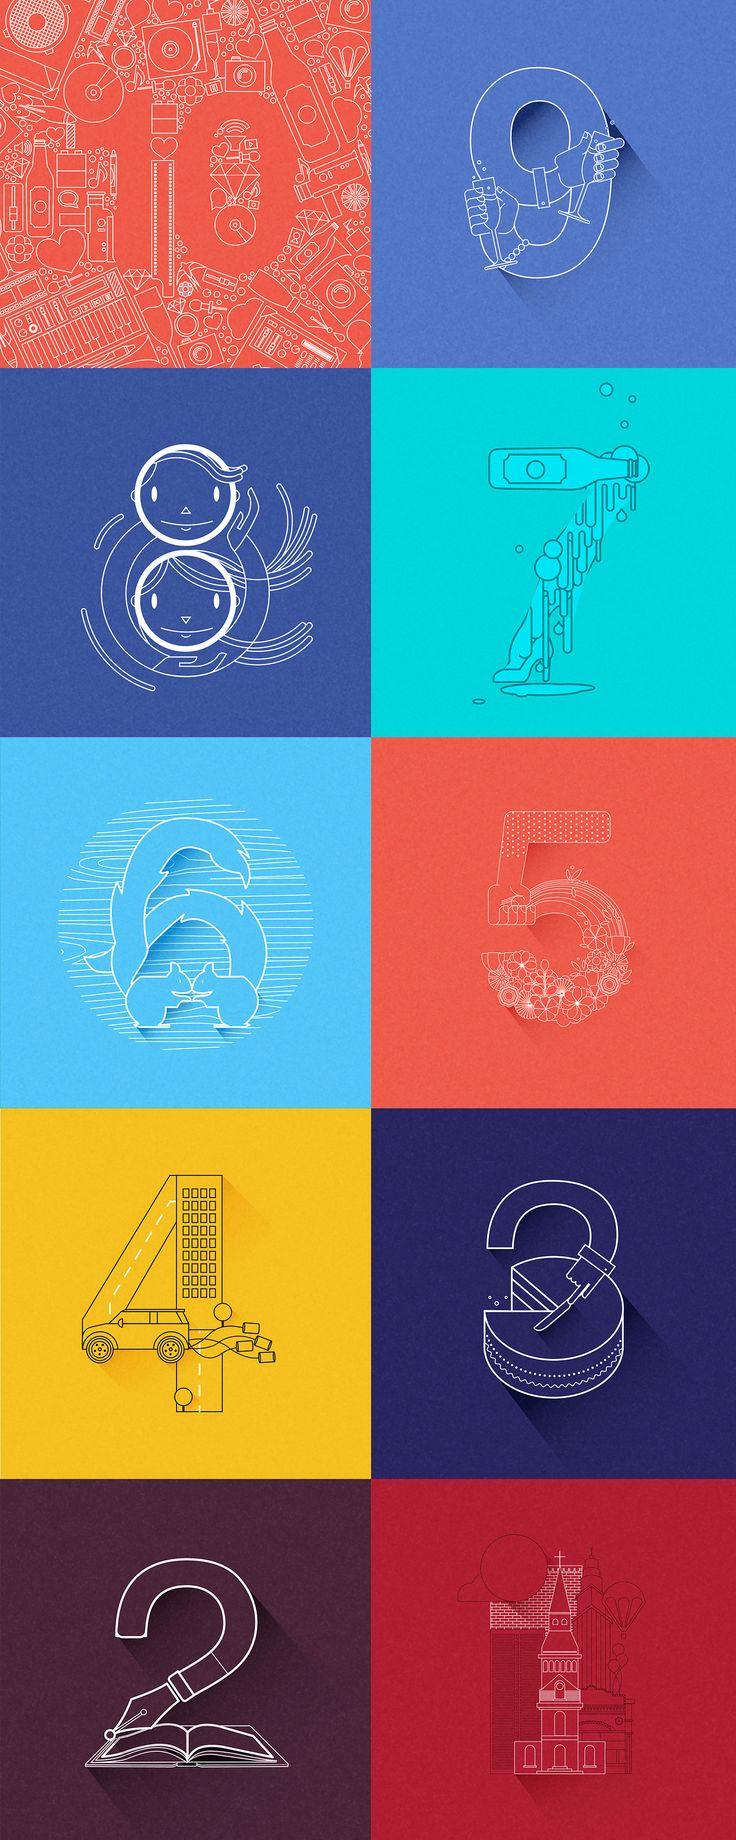 Serie de ilustraciones